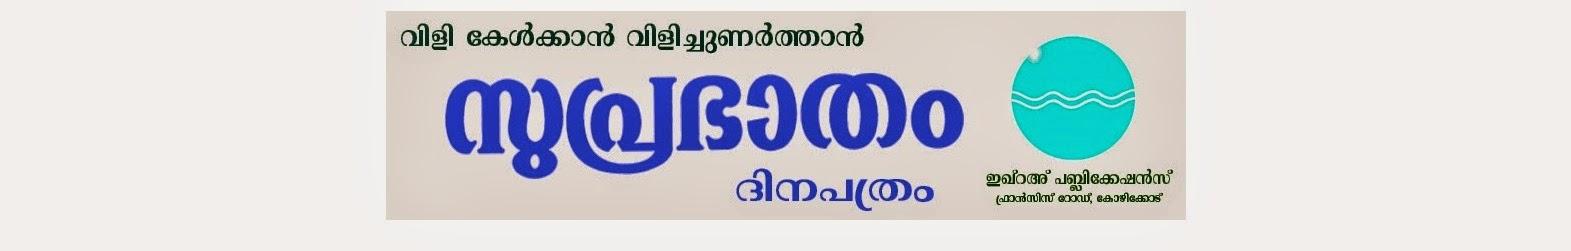 www.suprabhaatham.com